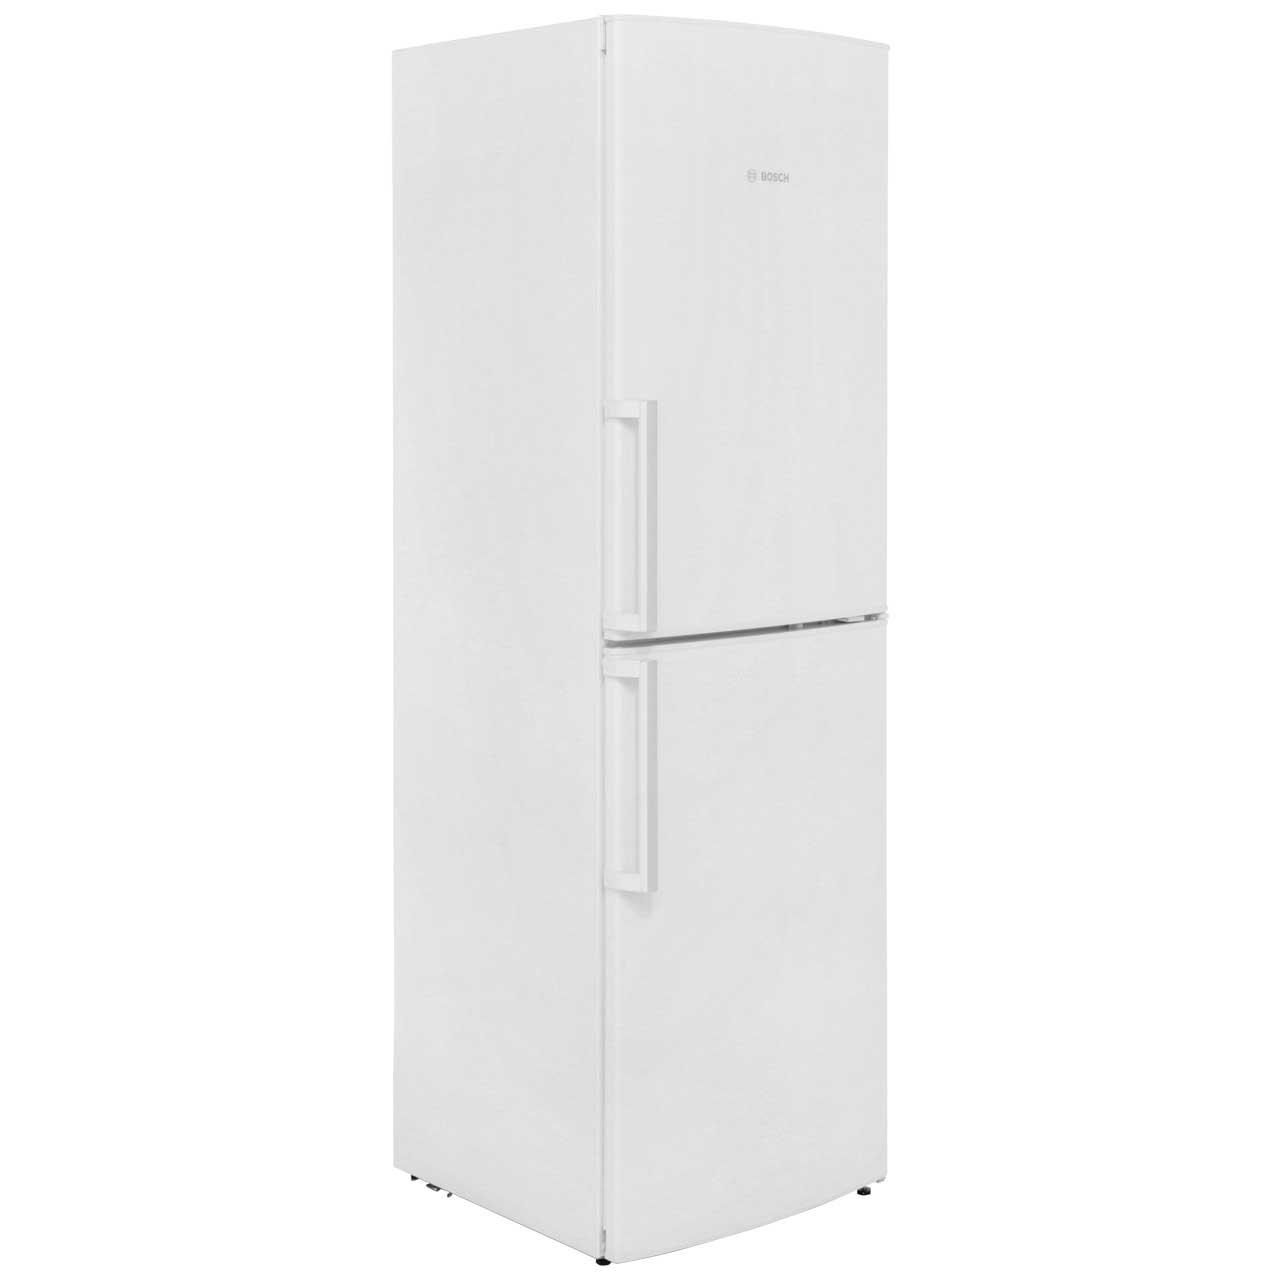 Bosch Serie 4 KGN34VW20G Free Standing Fridge Freezer Frost Free in White